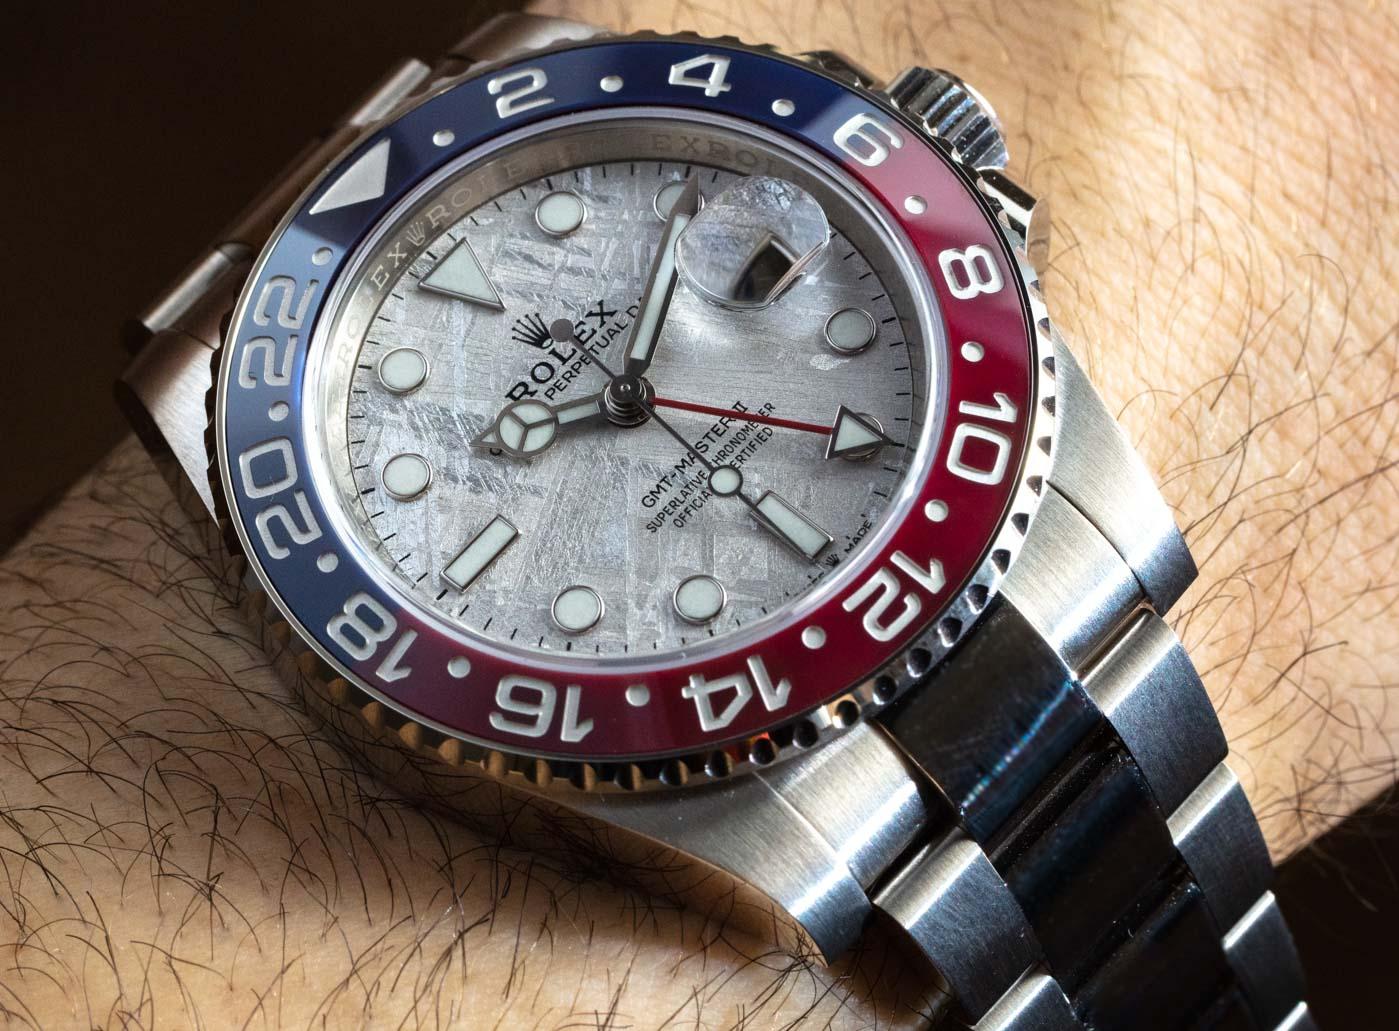 Rolex GMT-Master II 126719BLRO 「百事圈」隕石表盤腕表評測 | aBlogtoWatch